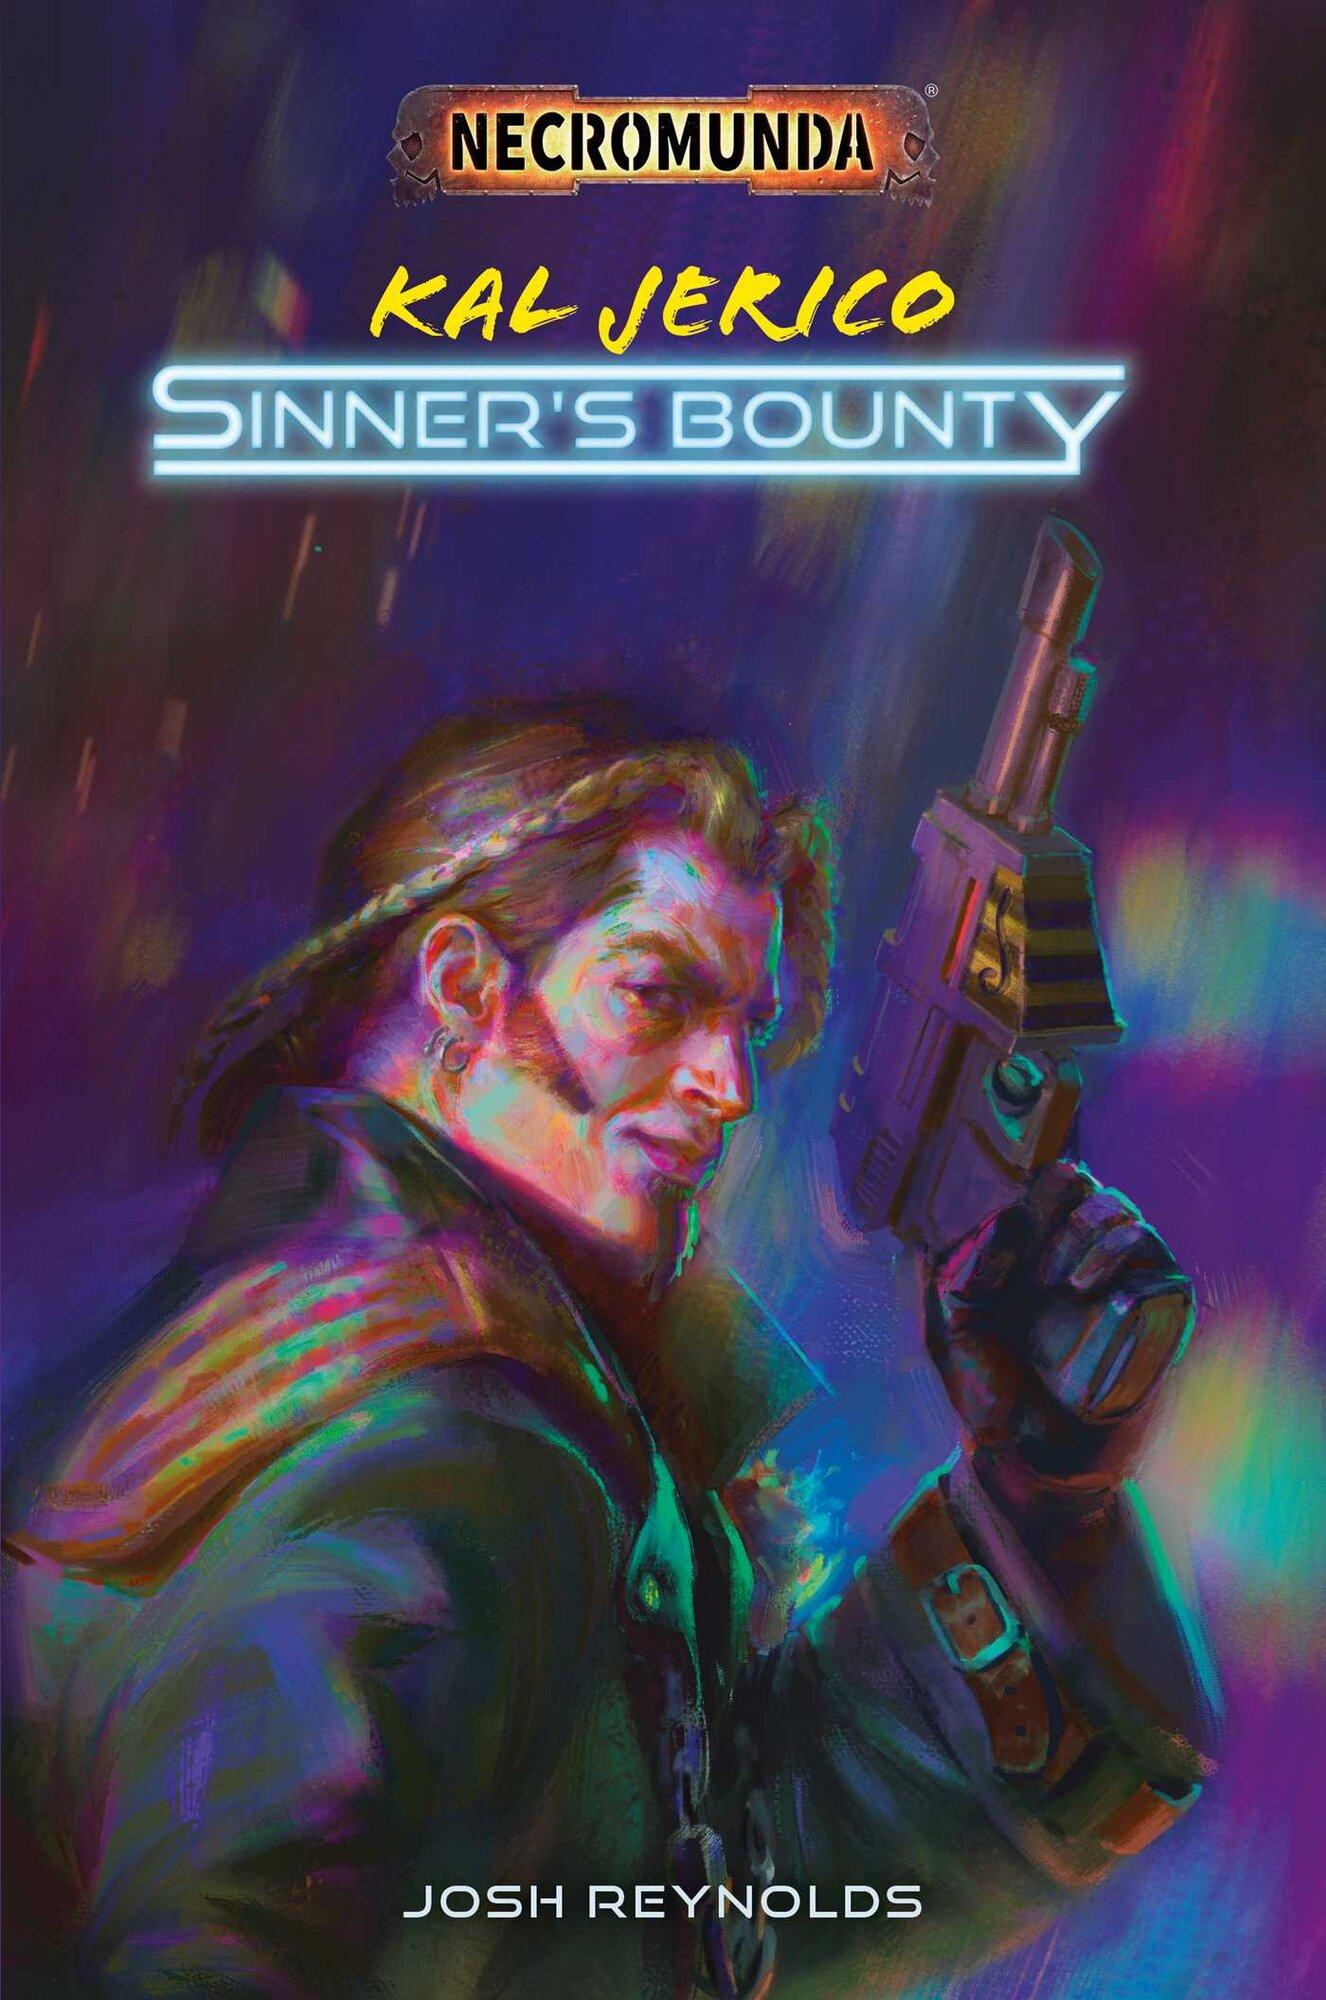 kal-jerico-sinners-bounty-9781789991840_hr.jpg